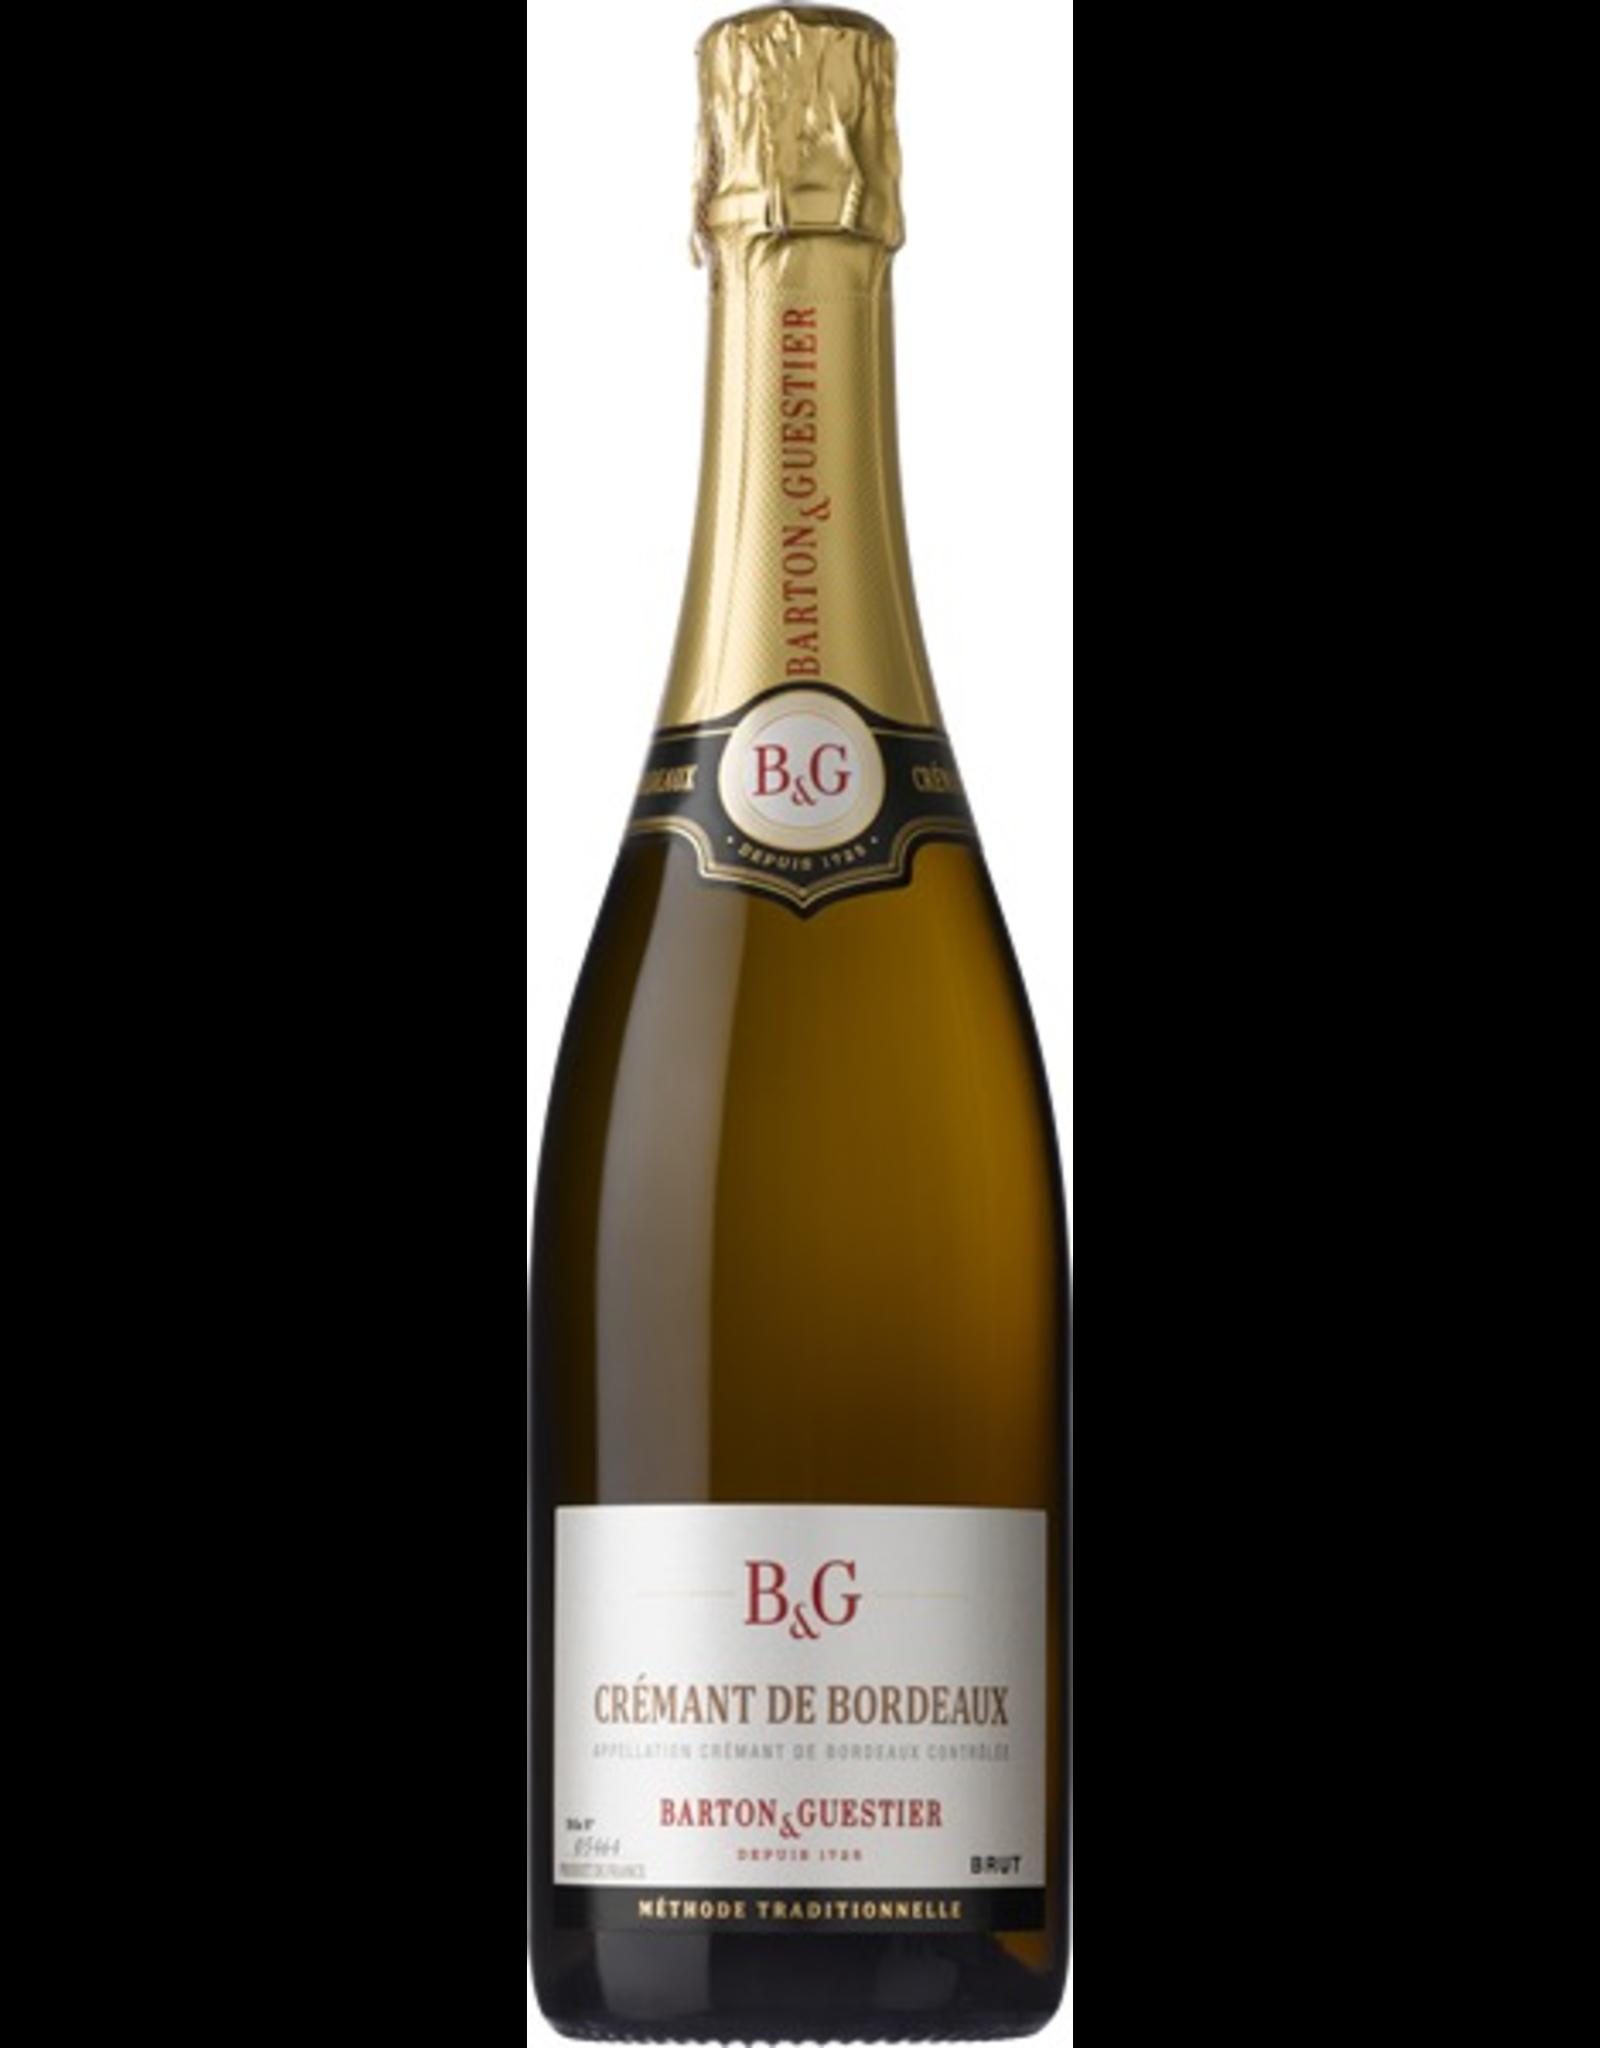 Sparkling Wine NV, Barton & Guestier Cremant Be Bordeaux BRUT, BRUT Sparkling, Bordeaux, Bordeaux, France, 12.1% Alc, TW90